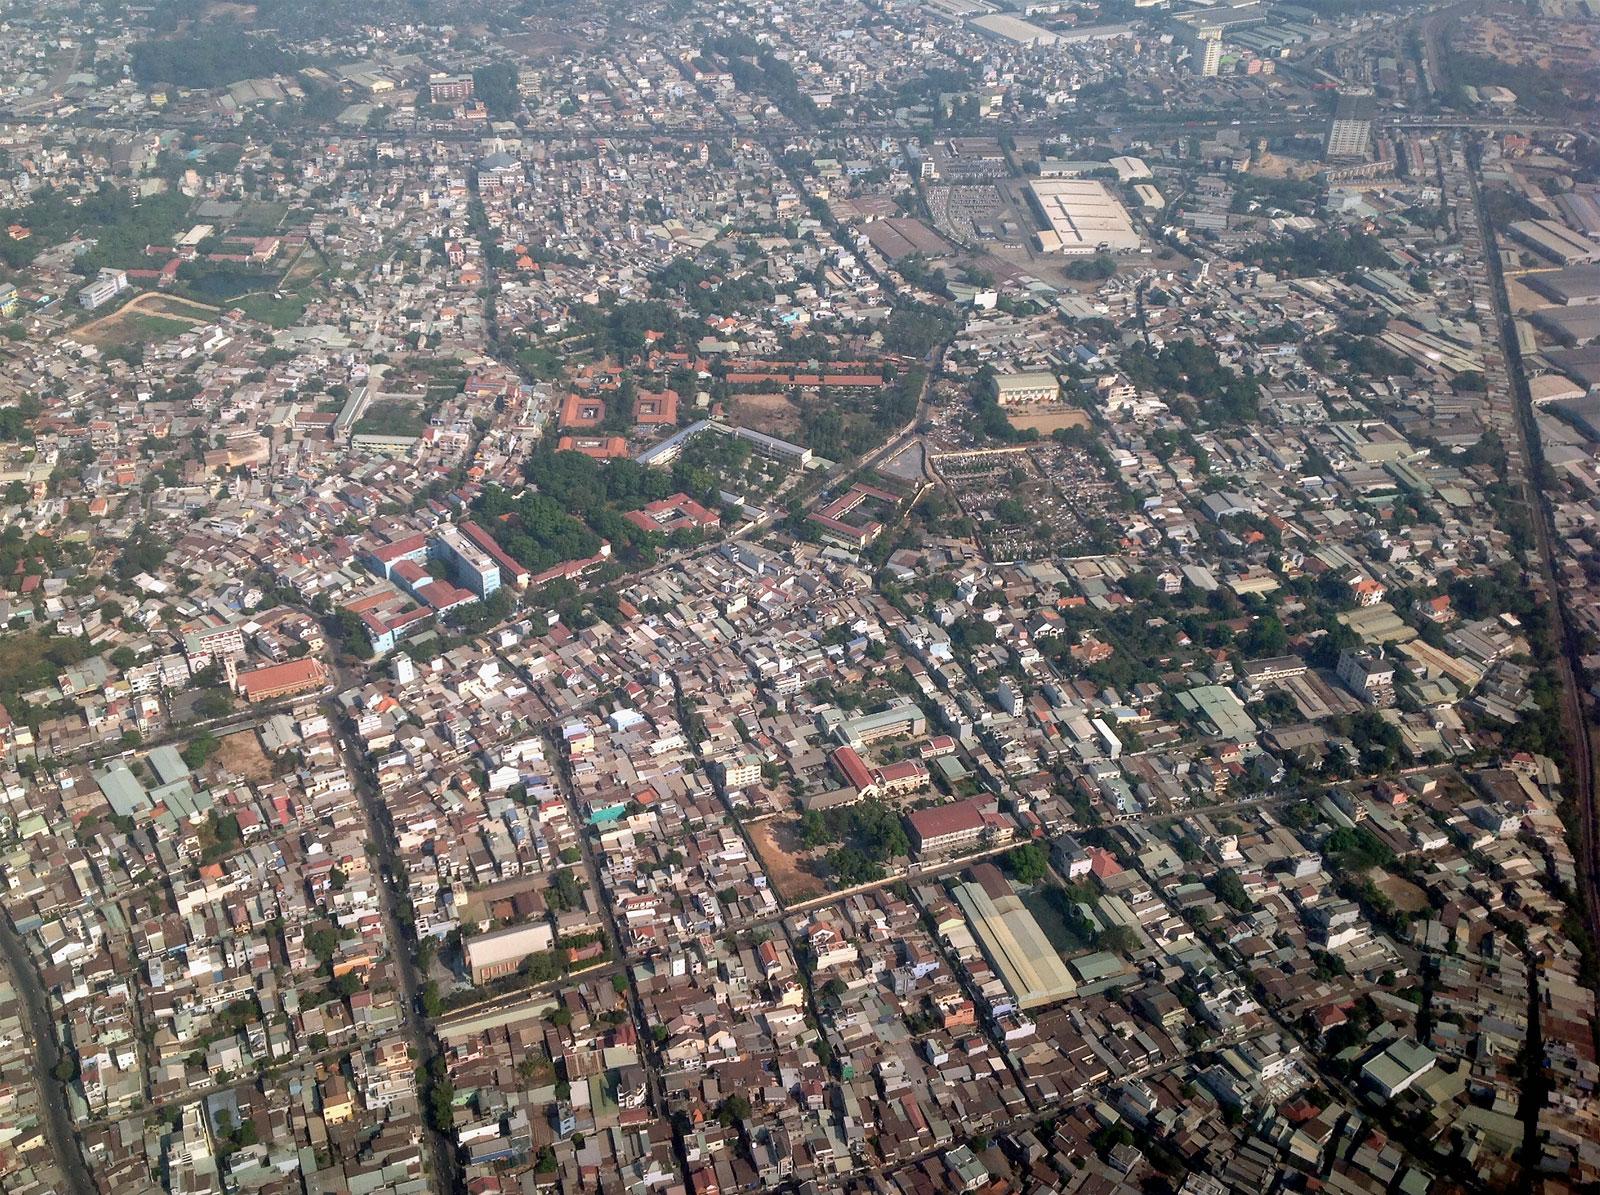 Жилые кварталы Хошимина перед посадкой в аэропорту Тан Сон Нхат